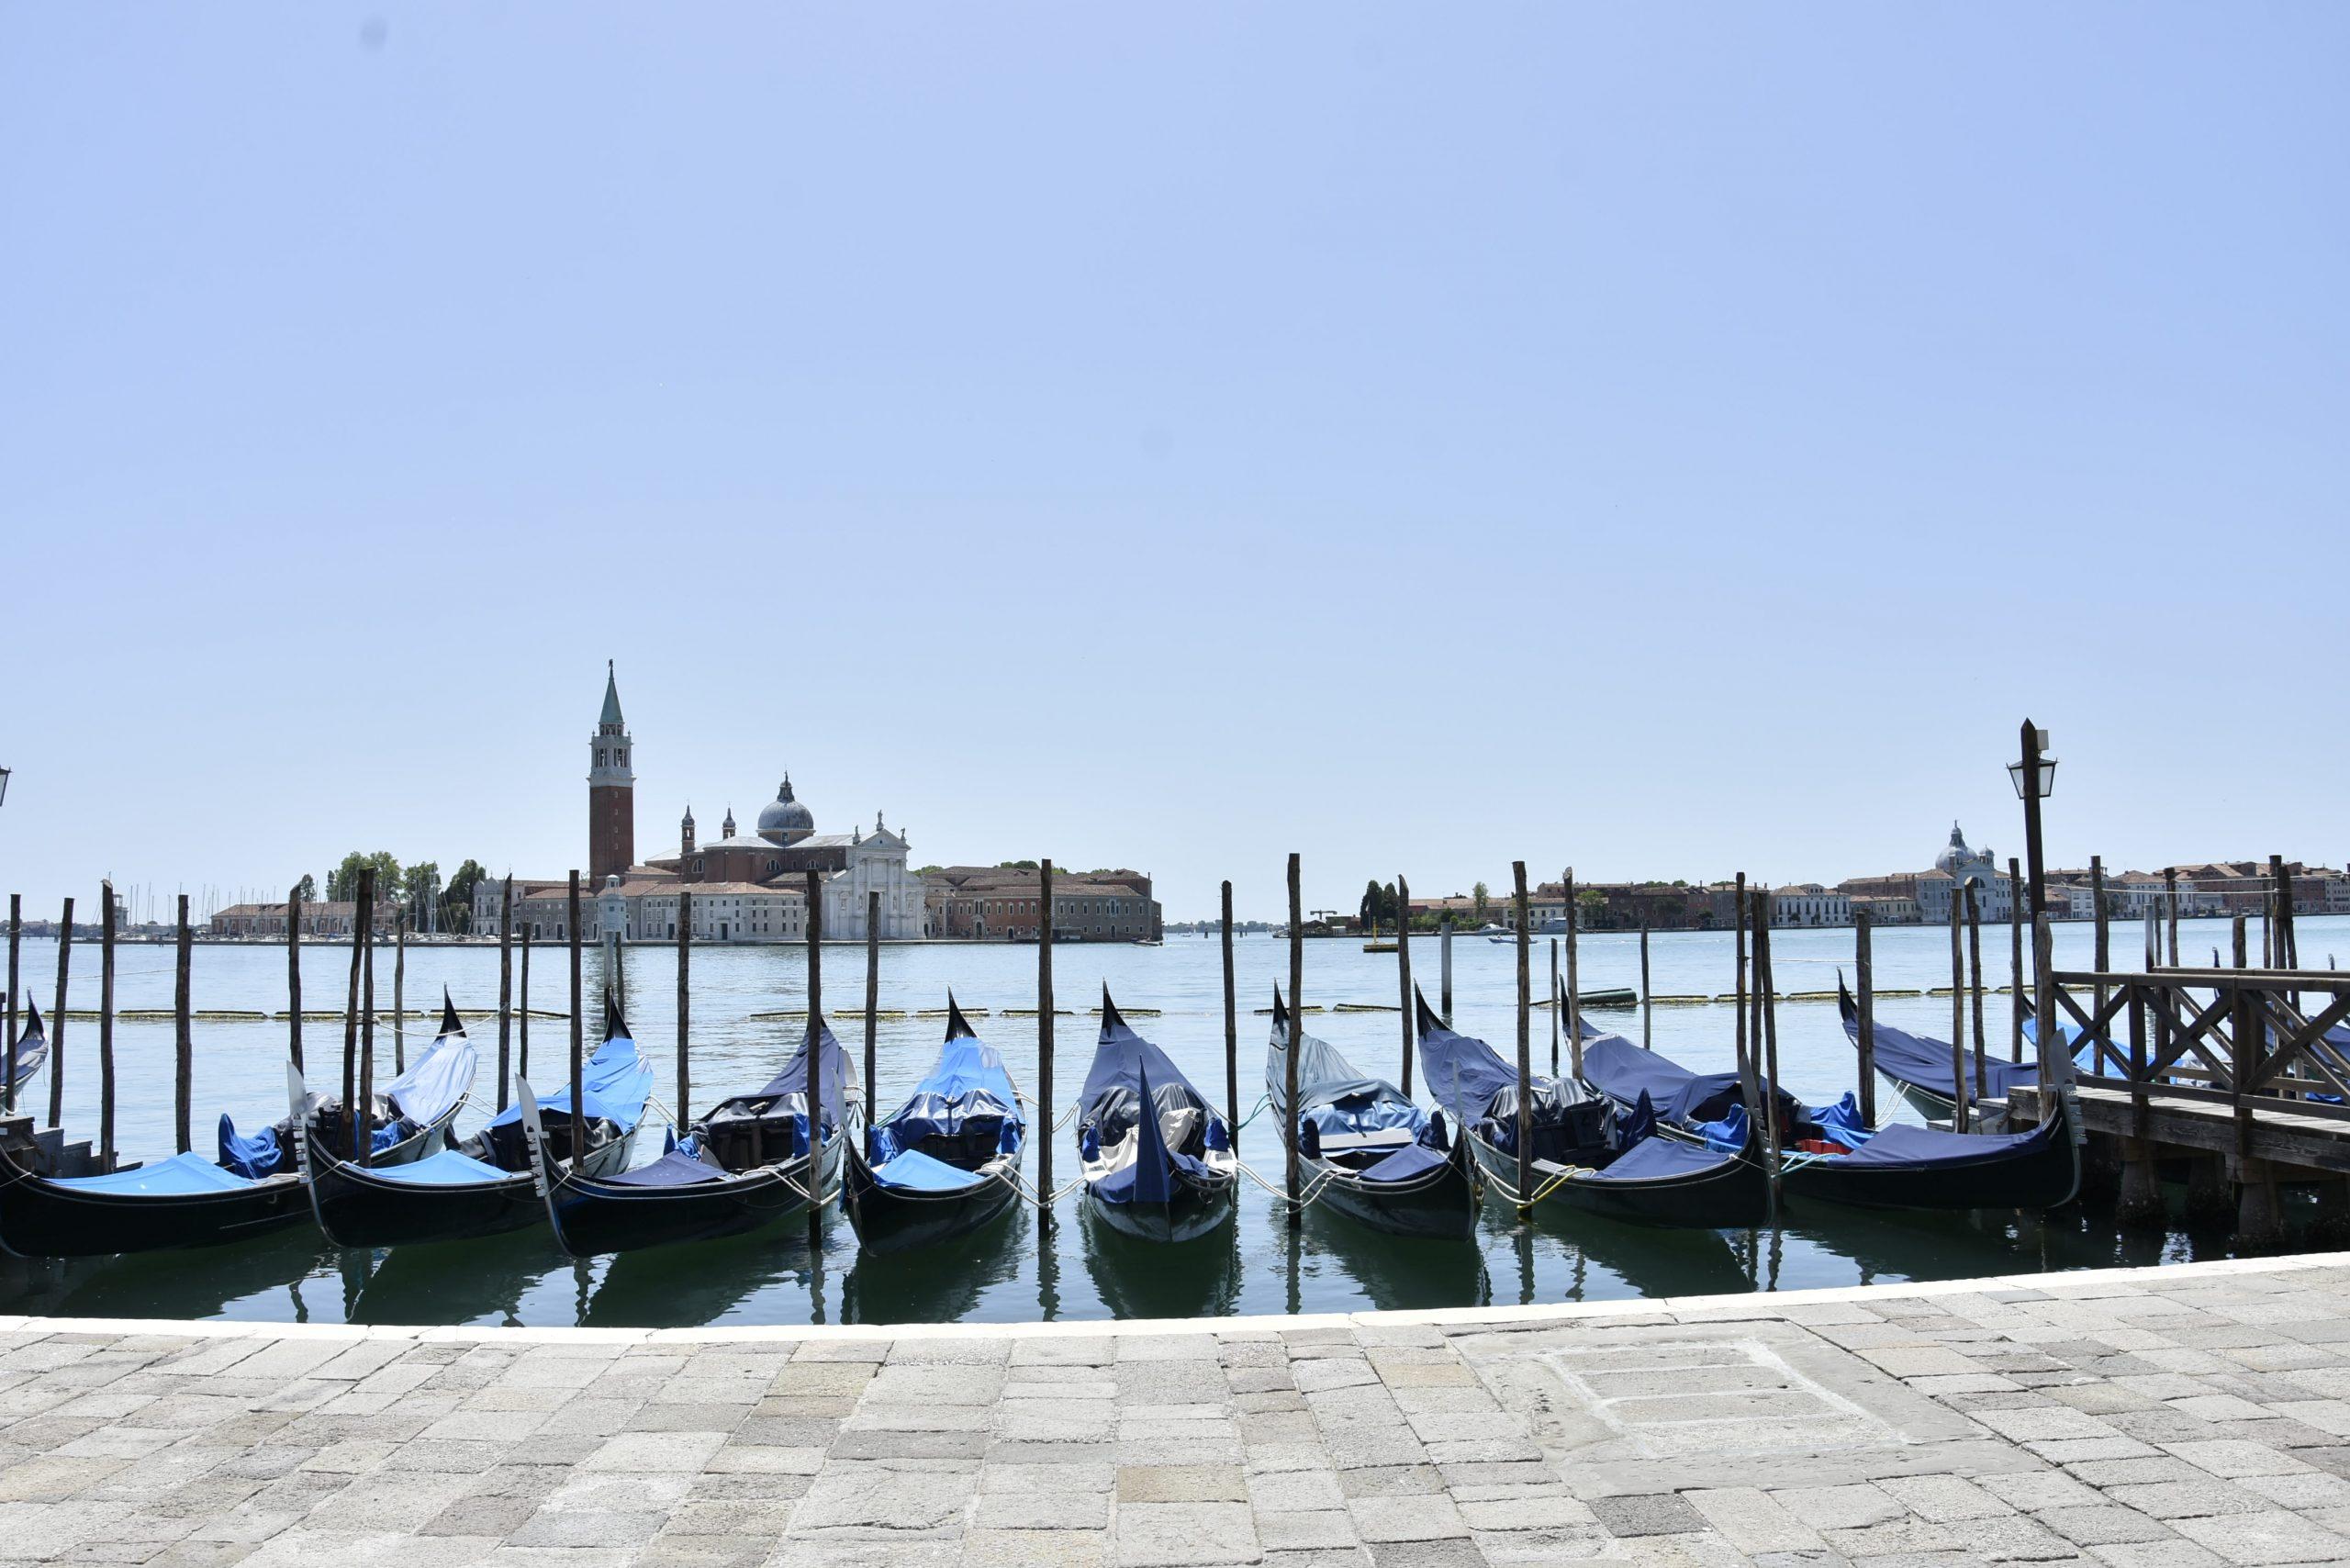 Venetian gondolas without people blue sky